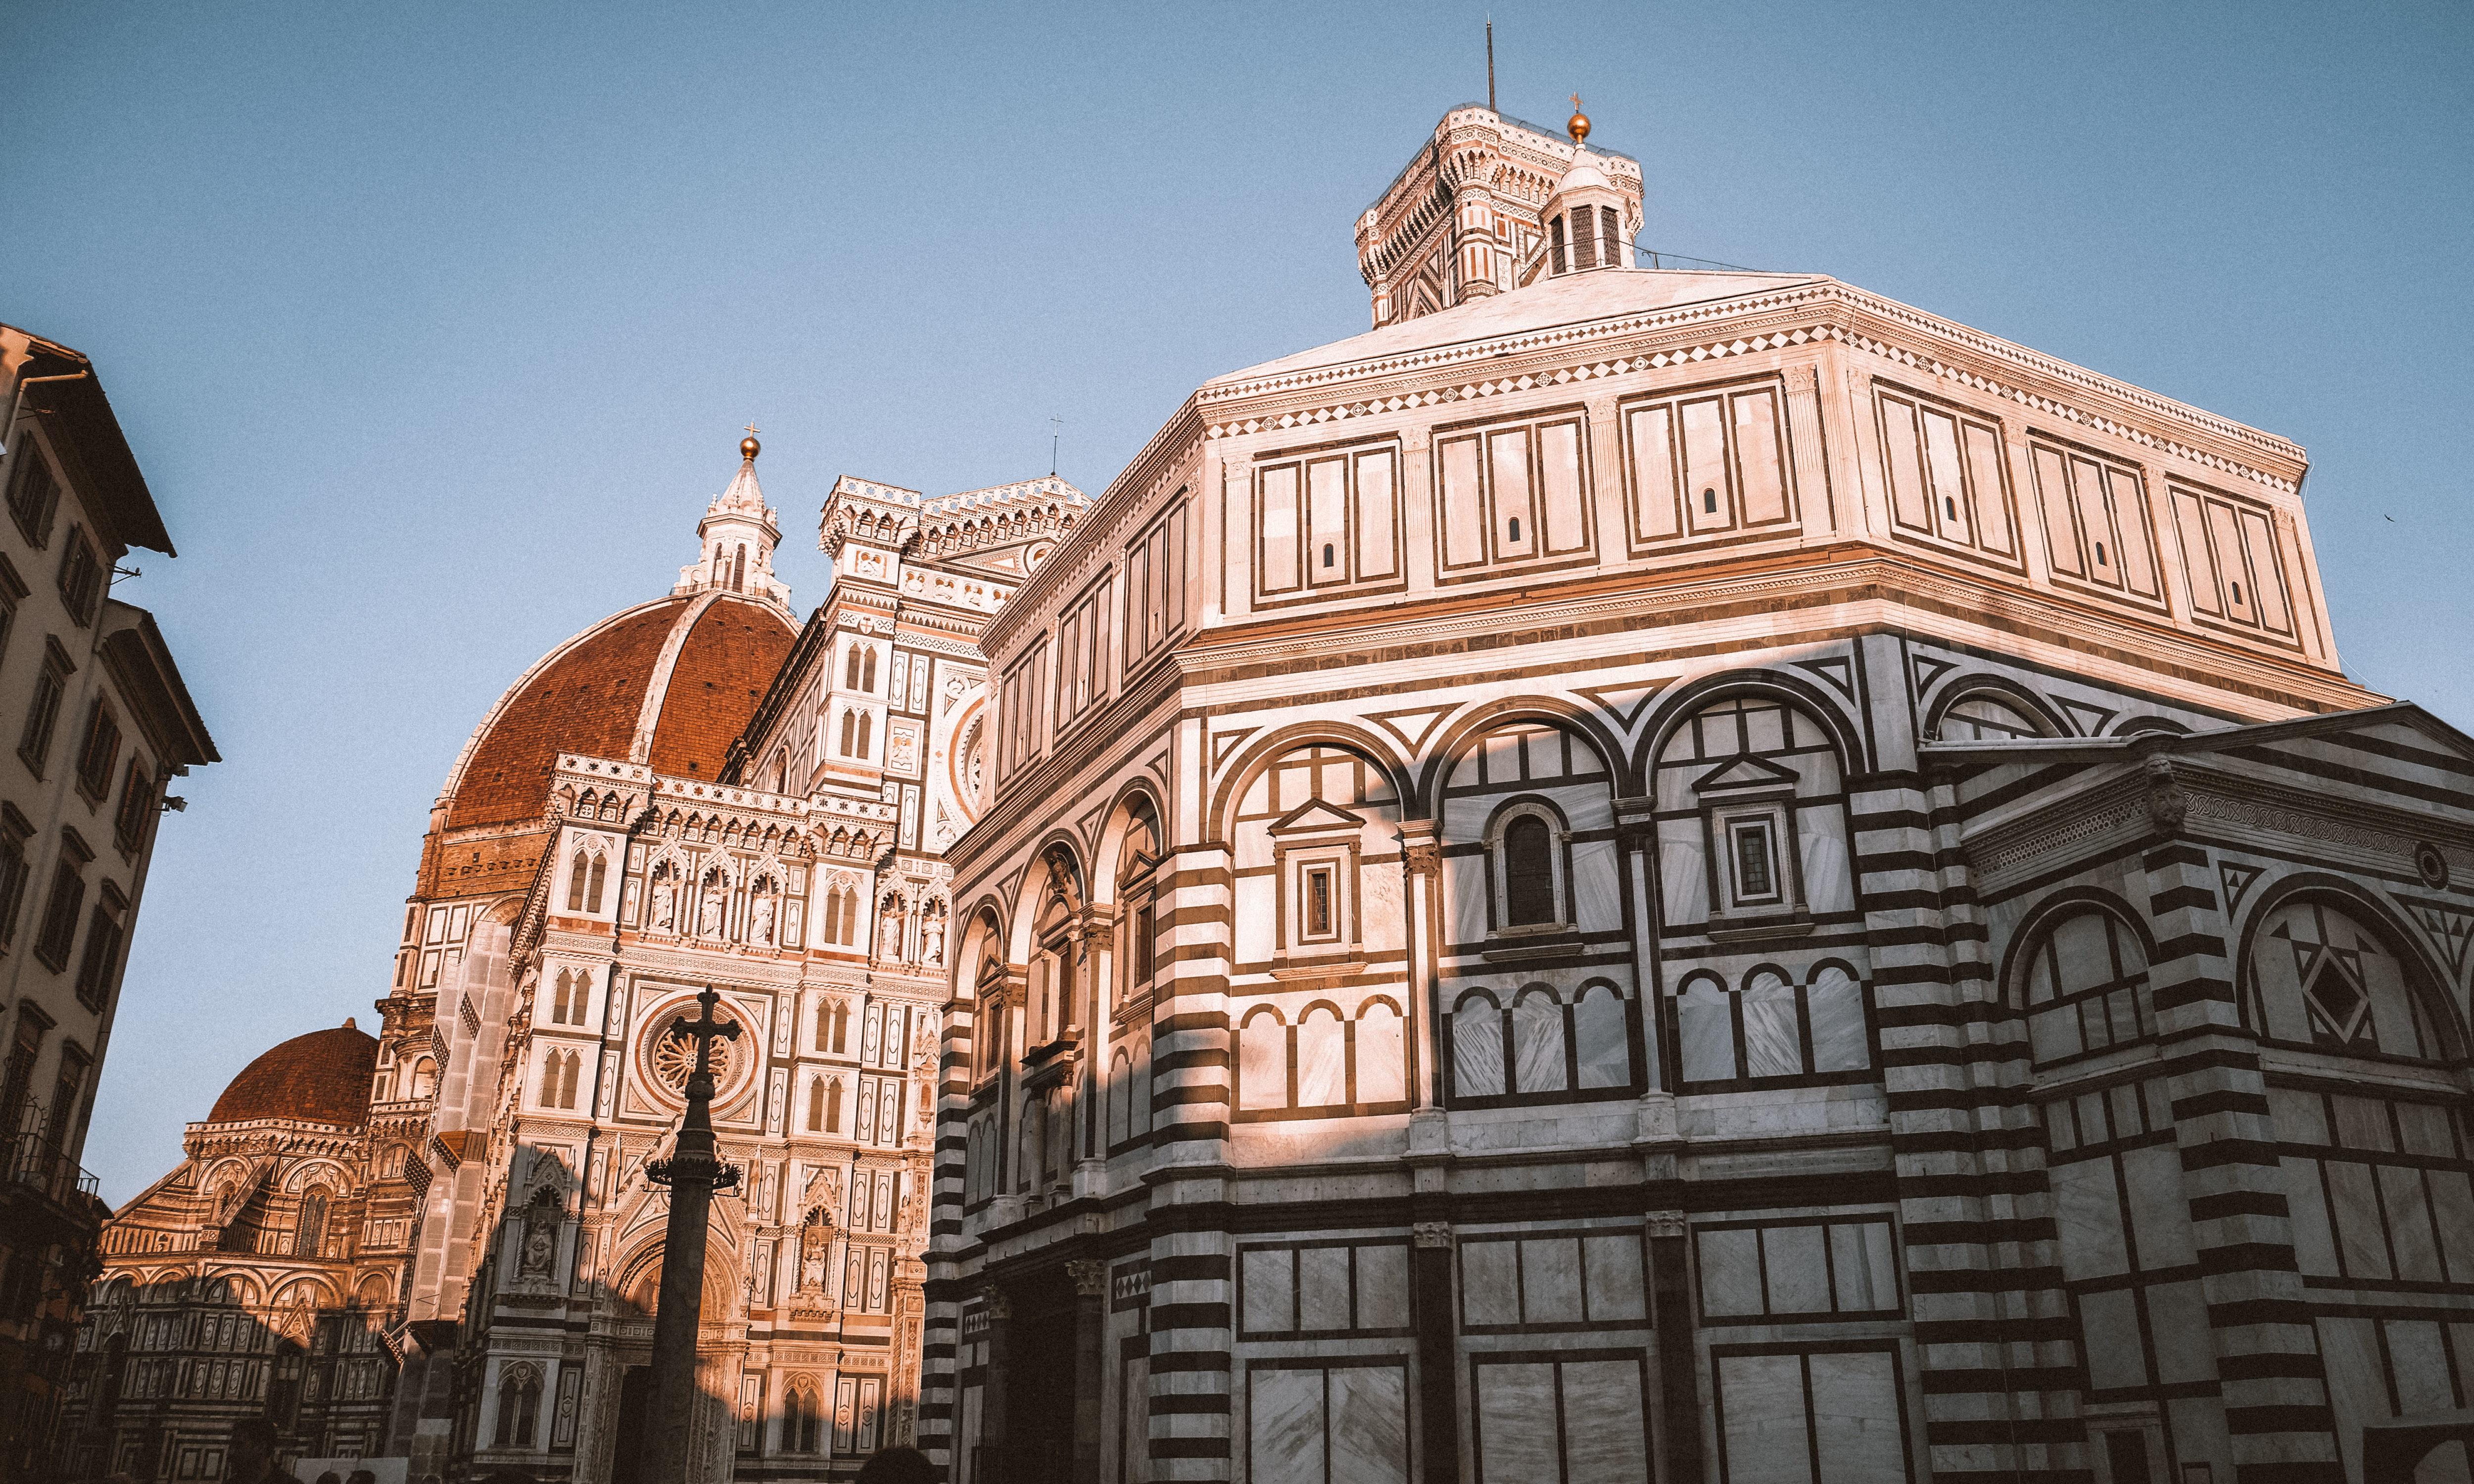 ITALIE FLORENCE TOSCANA (35)